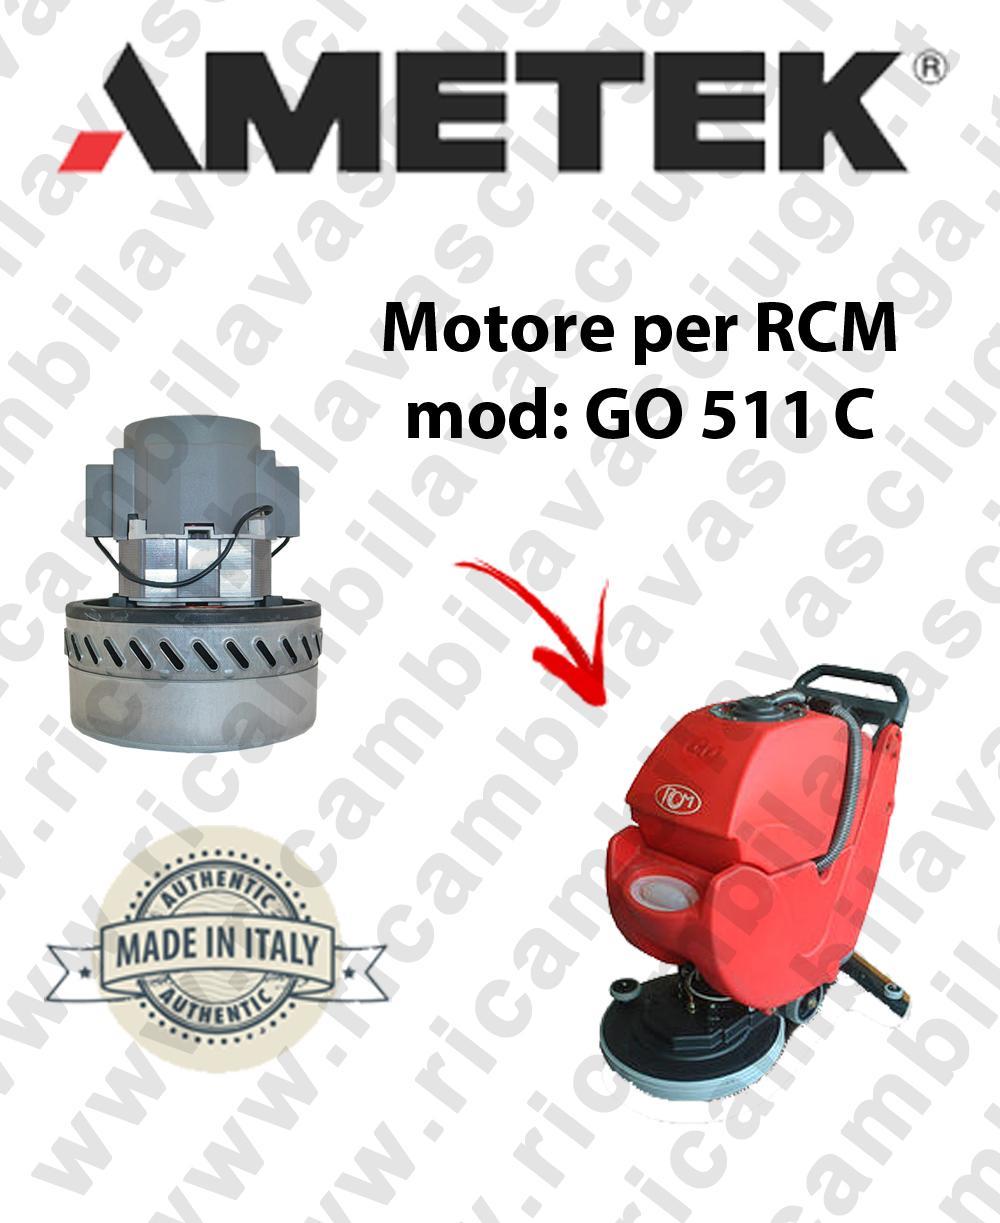 GO 511 C Saugmotor AMETEK für scheuersaugmaschinen RCM